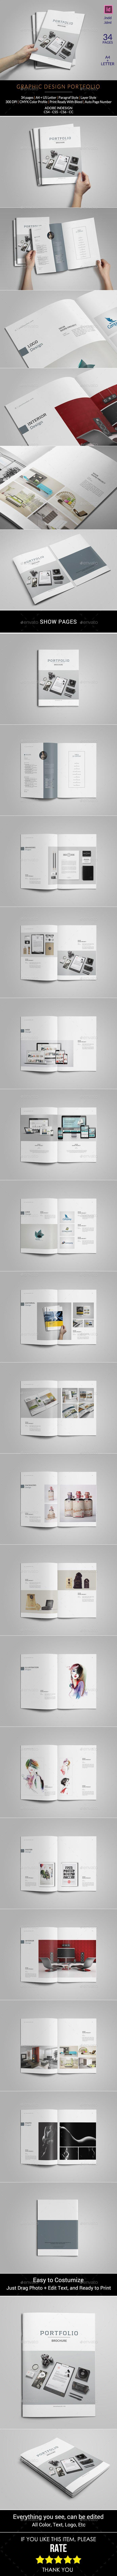 Portfolio Brochure Template InDesign INDD #design Download: http://graphicriver.net/item/portfolio-template/13084867?ref=ksioks